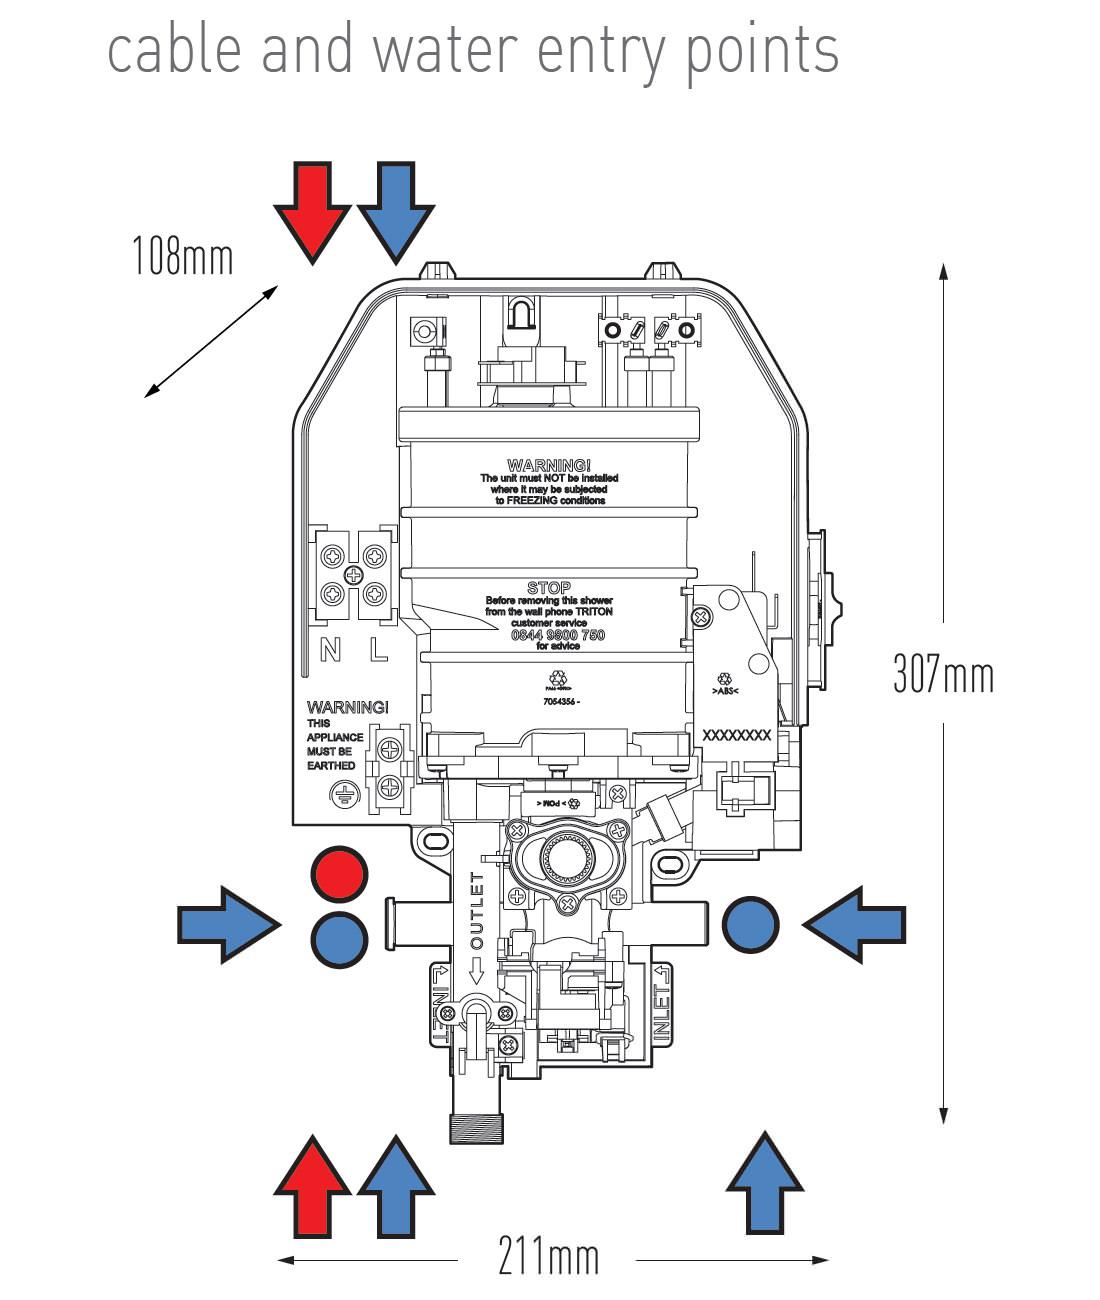 vado black singles Vado hydroflow low pressure single lever cartridge st-212k-car £2750 £3300  duravit vero series black toilet seat & cover soft close 0067690800.